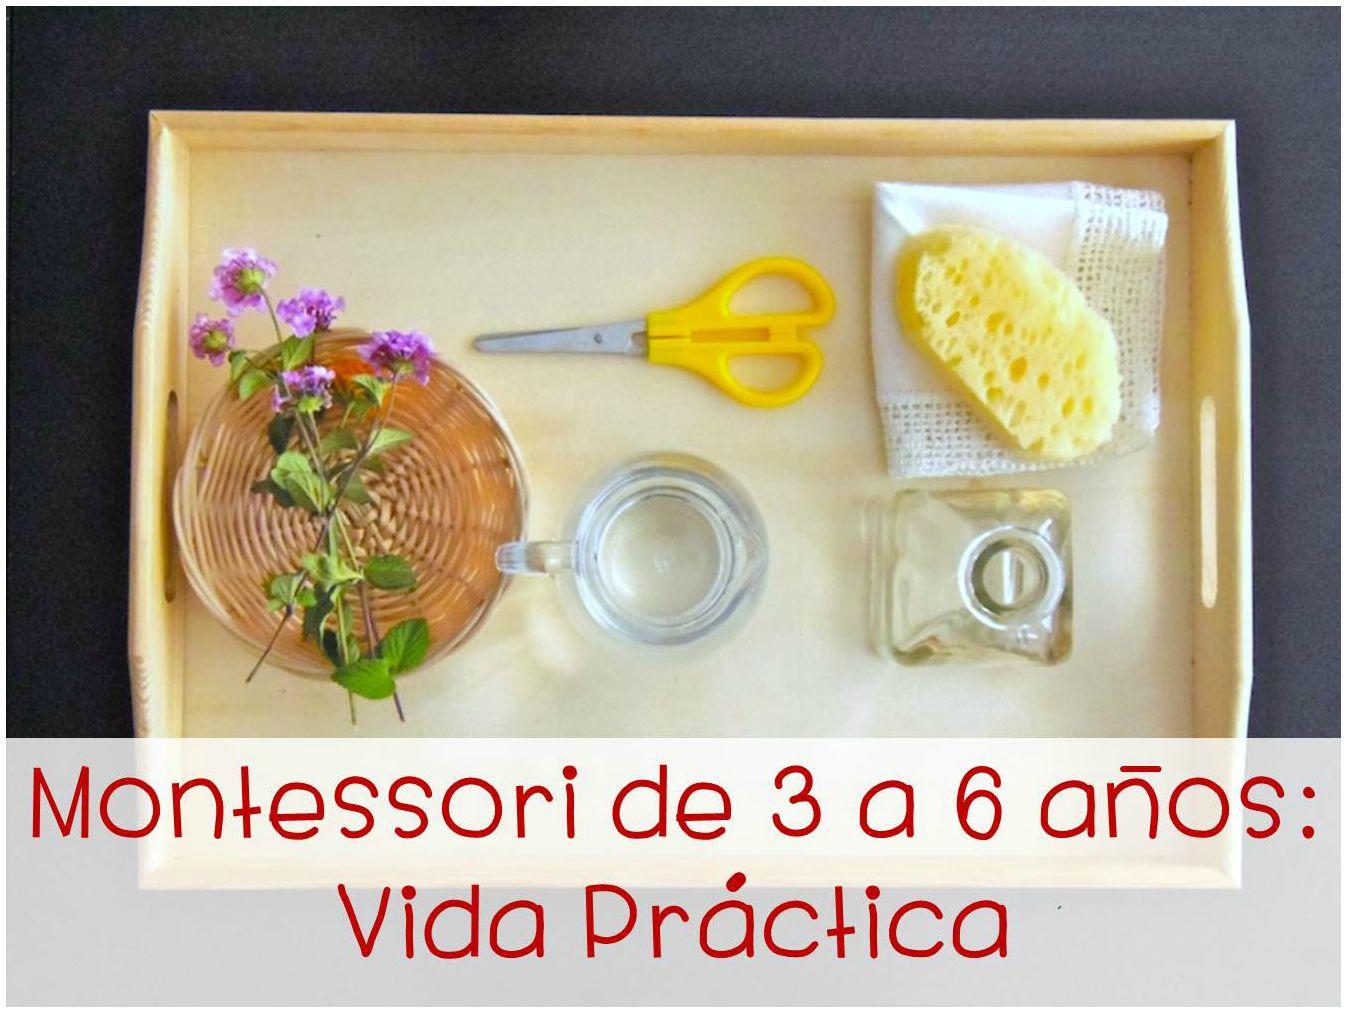 Curso Online Montessori De 3 A 6 Anos Vida Practica Cursos